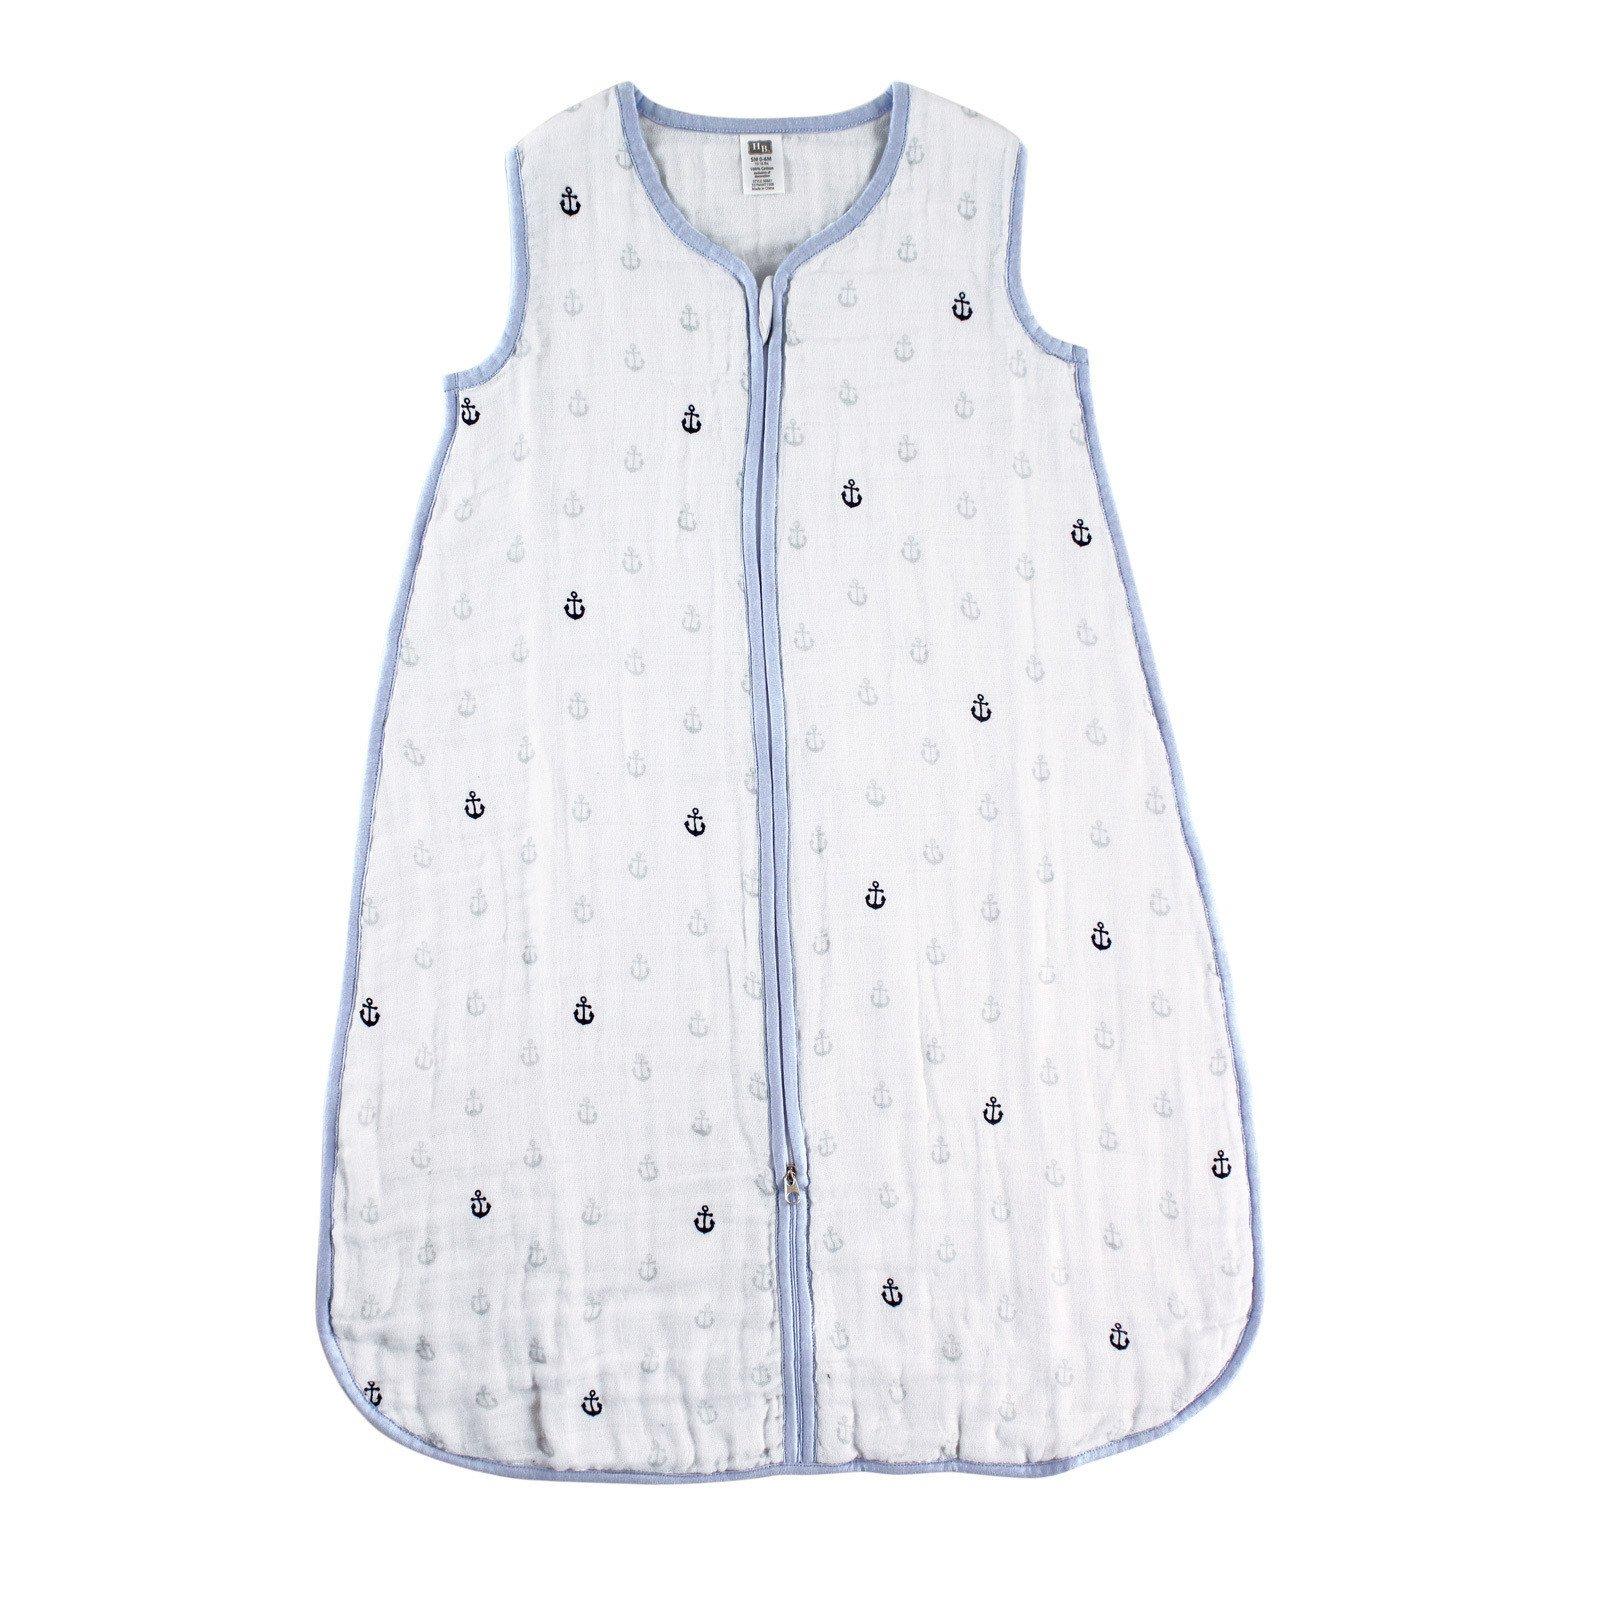 Hudson Baby Wearable Safe Sleep Muslin Sleeping Bag, Blue Anchors, 6-12 Months